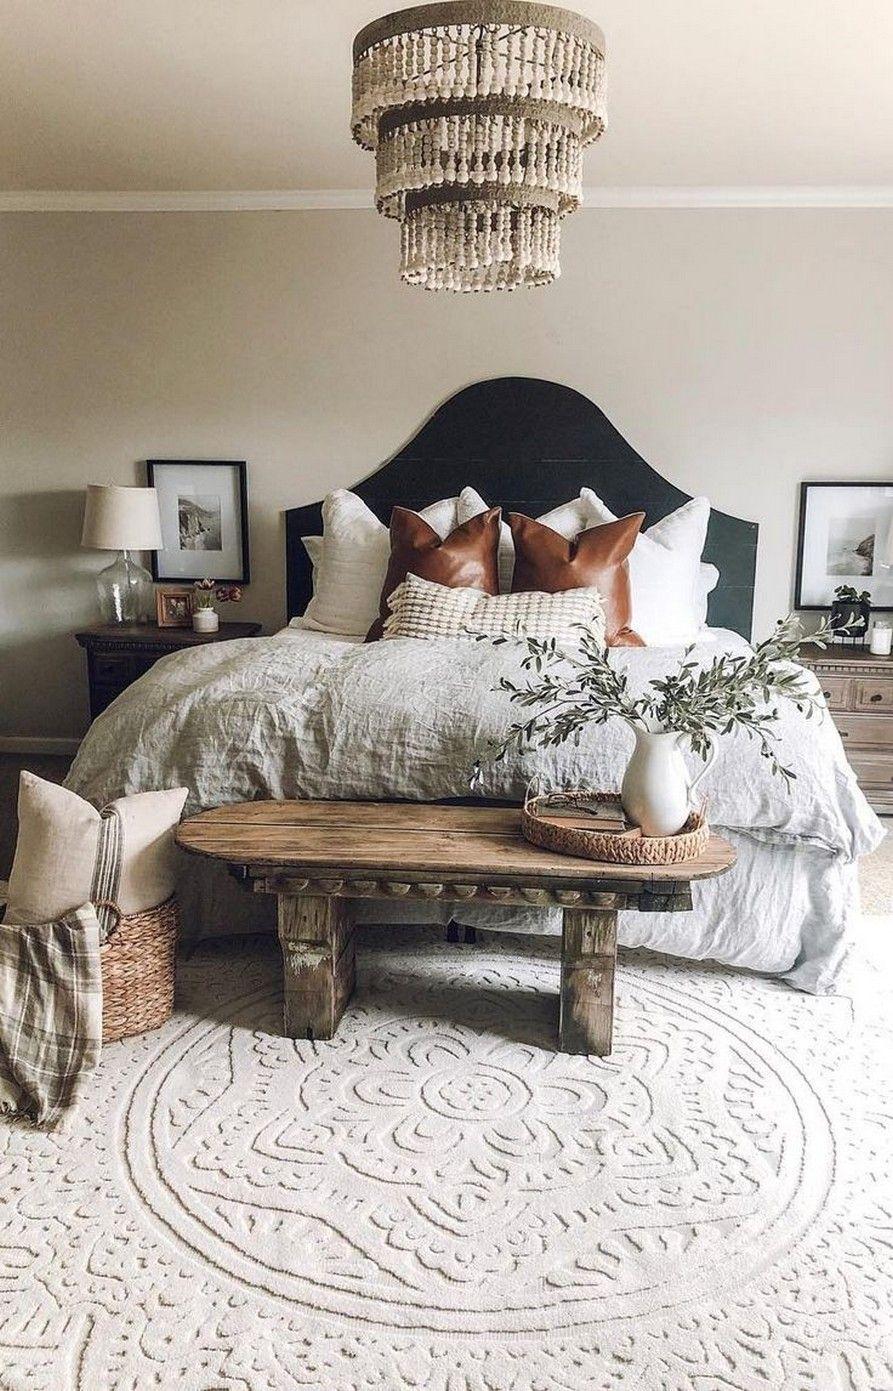 26 Comfy Bohemian Bedroom Ideas For Your Apartment Home Decor Modern Bedroom Design Bedroom Furnishings Modern Bedroom